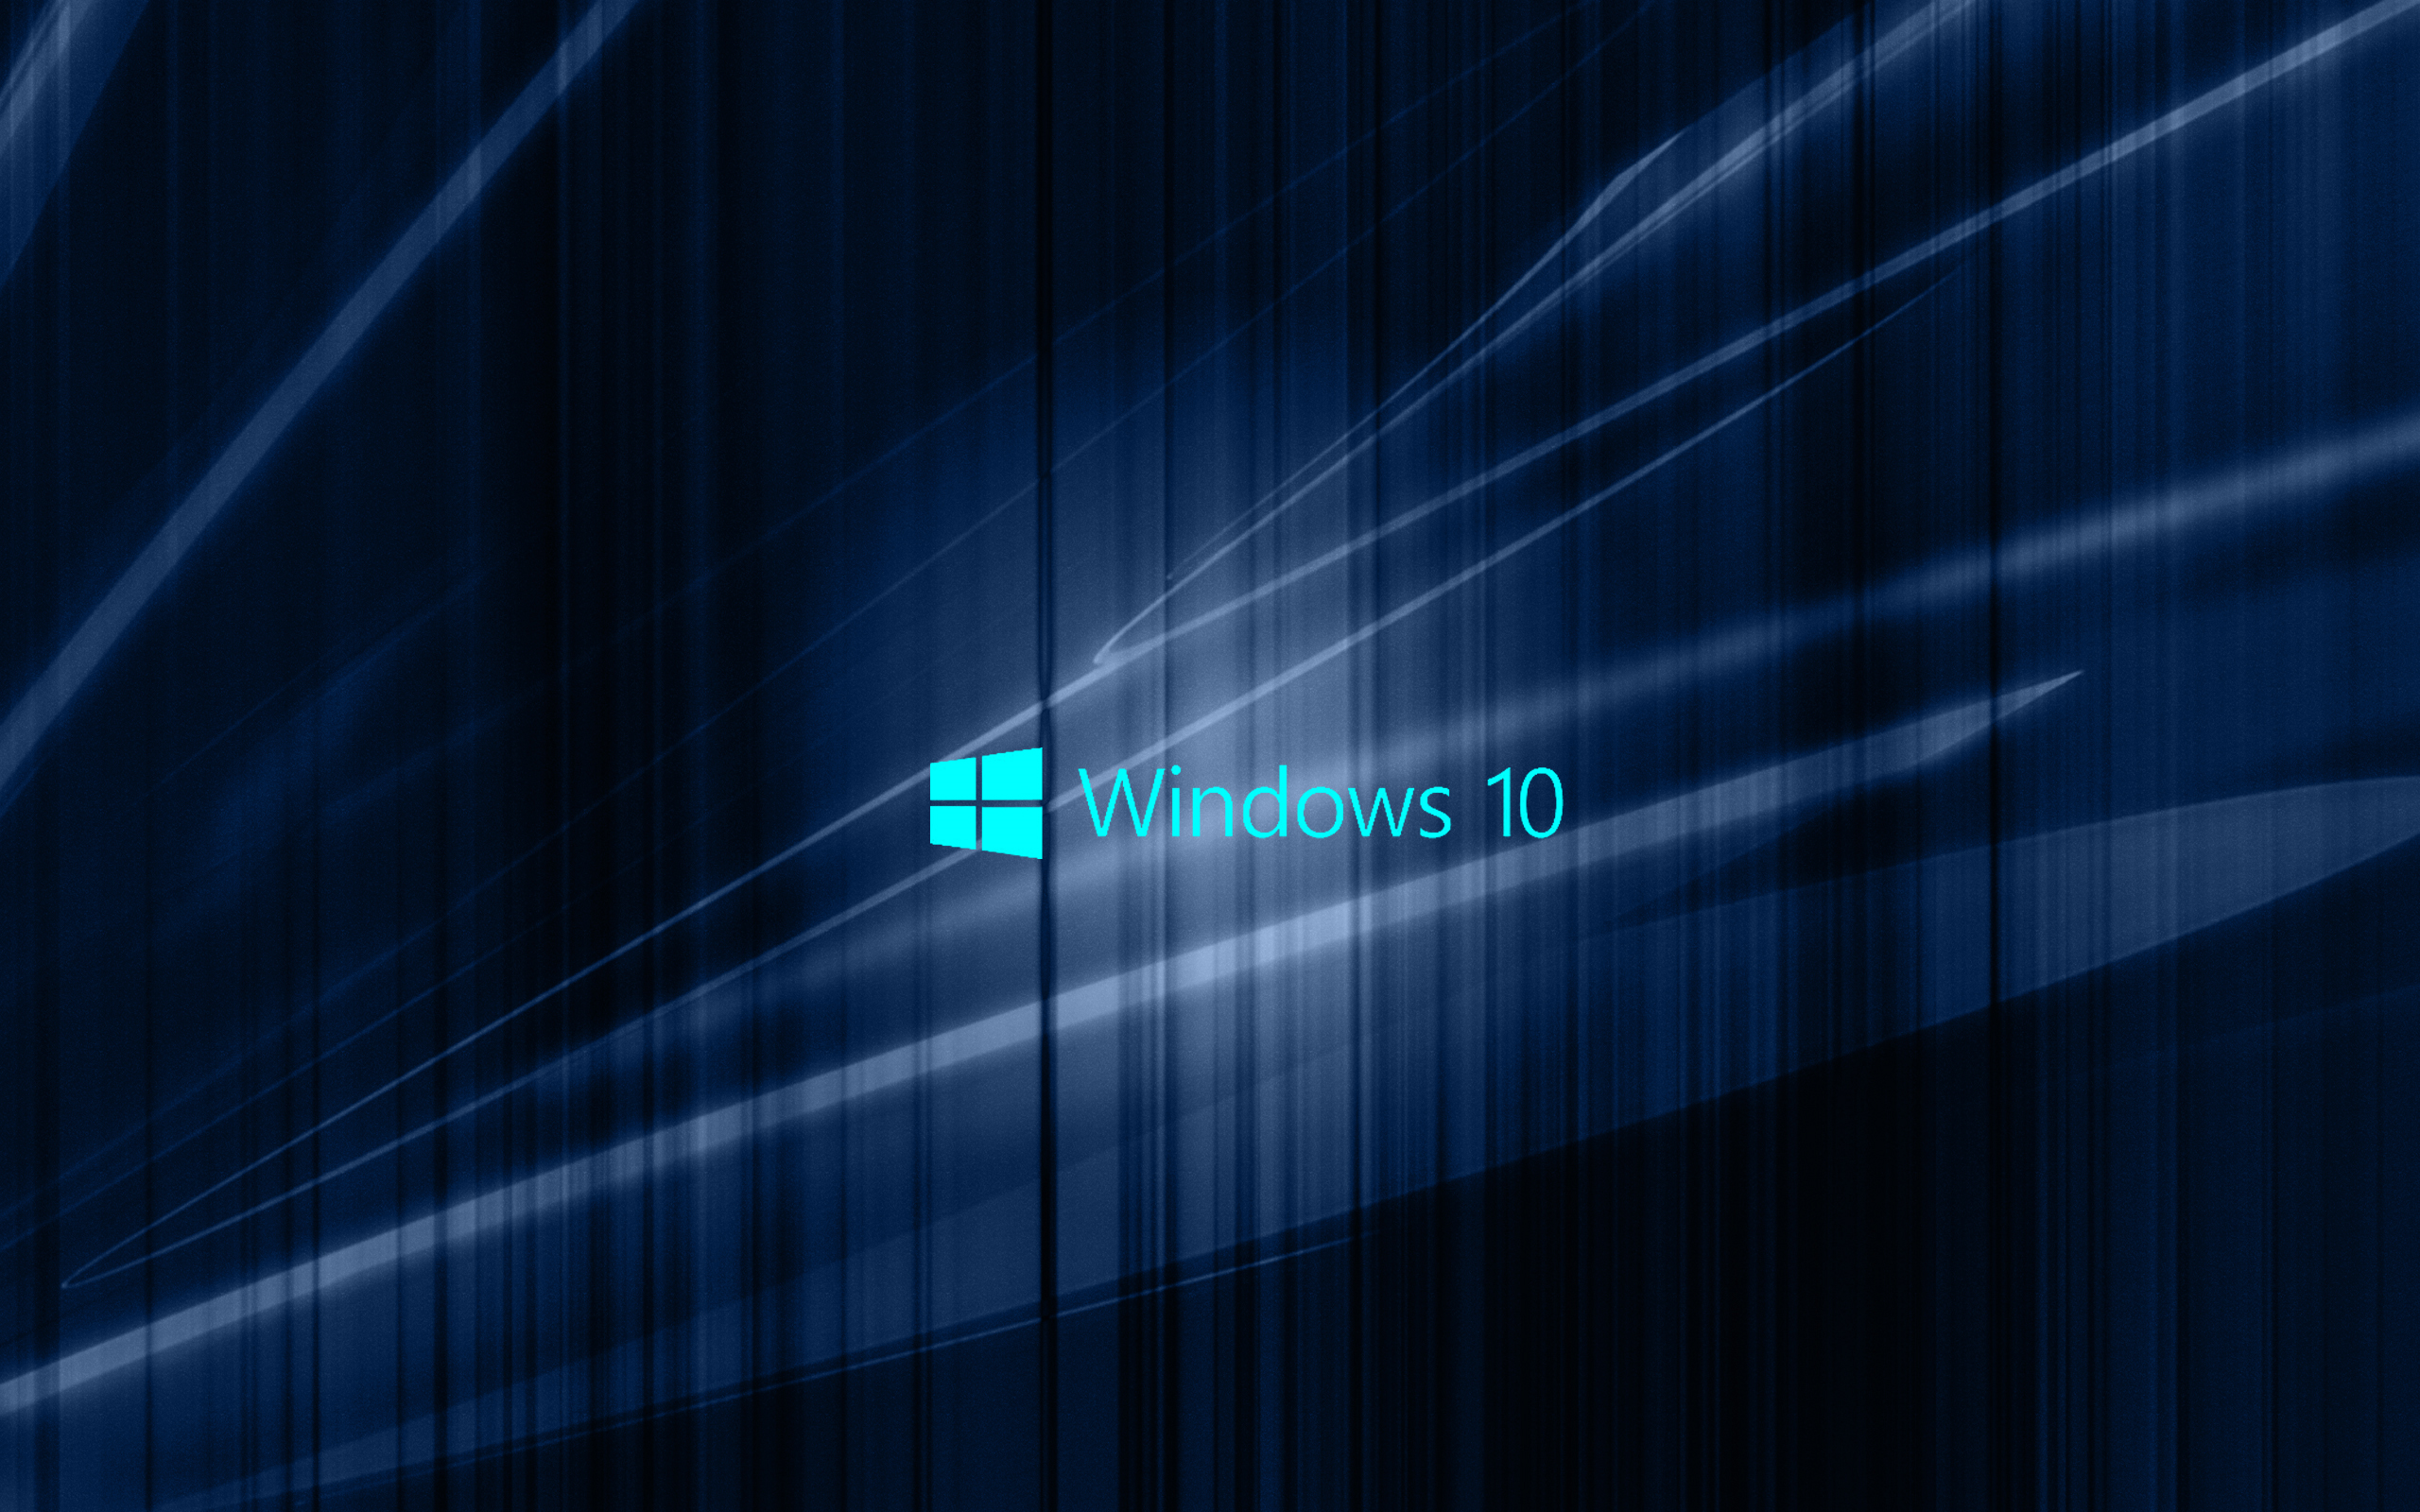 Desktop Wallpaper Download For Windows 10